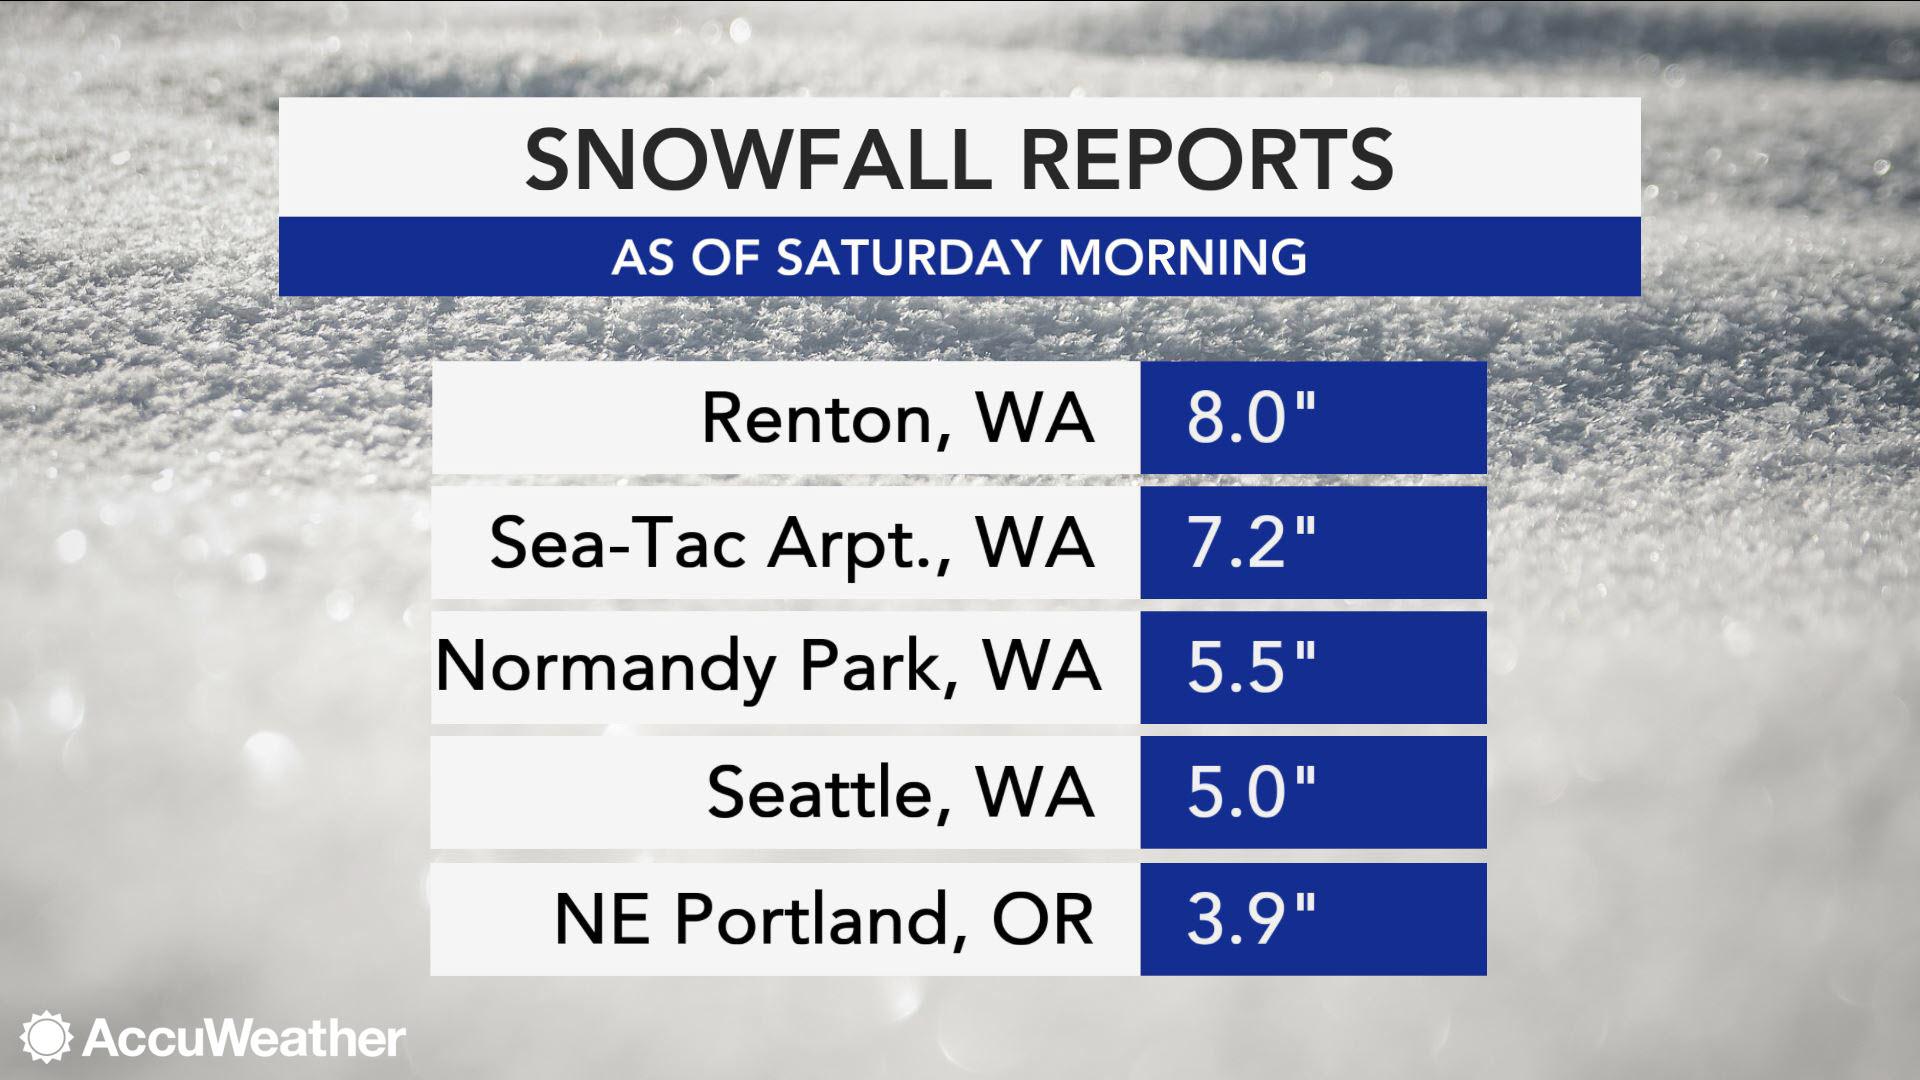 Live updates: Blizzard conditions shut down 20-mile stretch